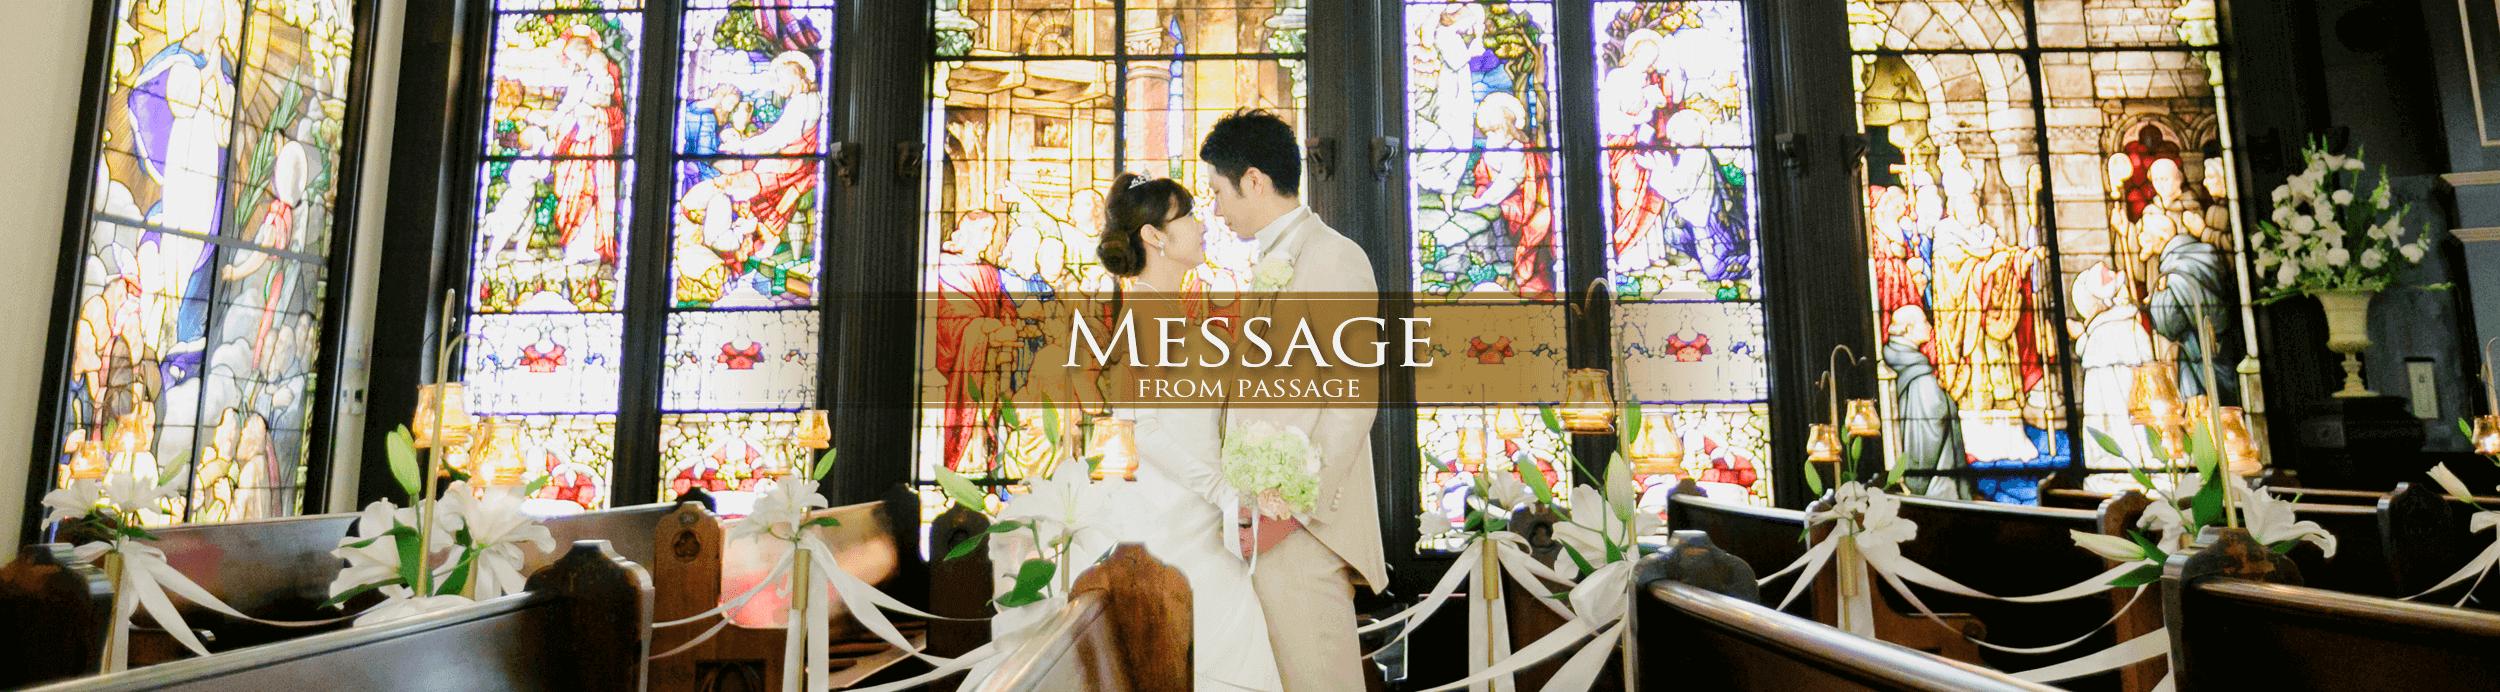 MESSAGE|パッサージュの想い